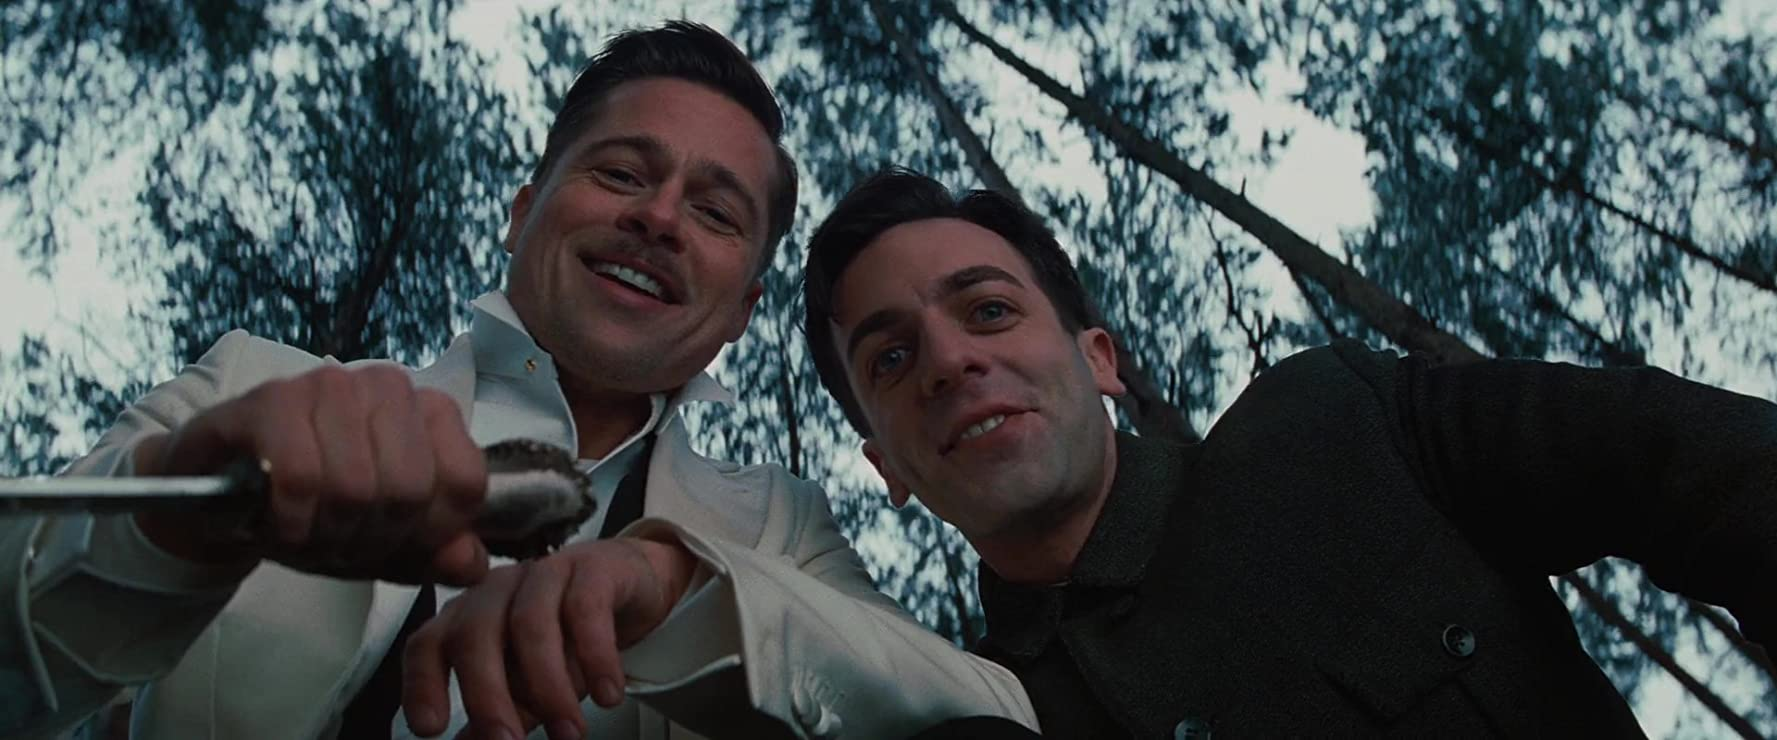 Brad Pitt and B.J. Novak in Inglourious Basterds (2009)